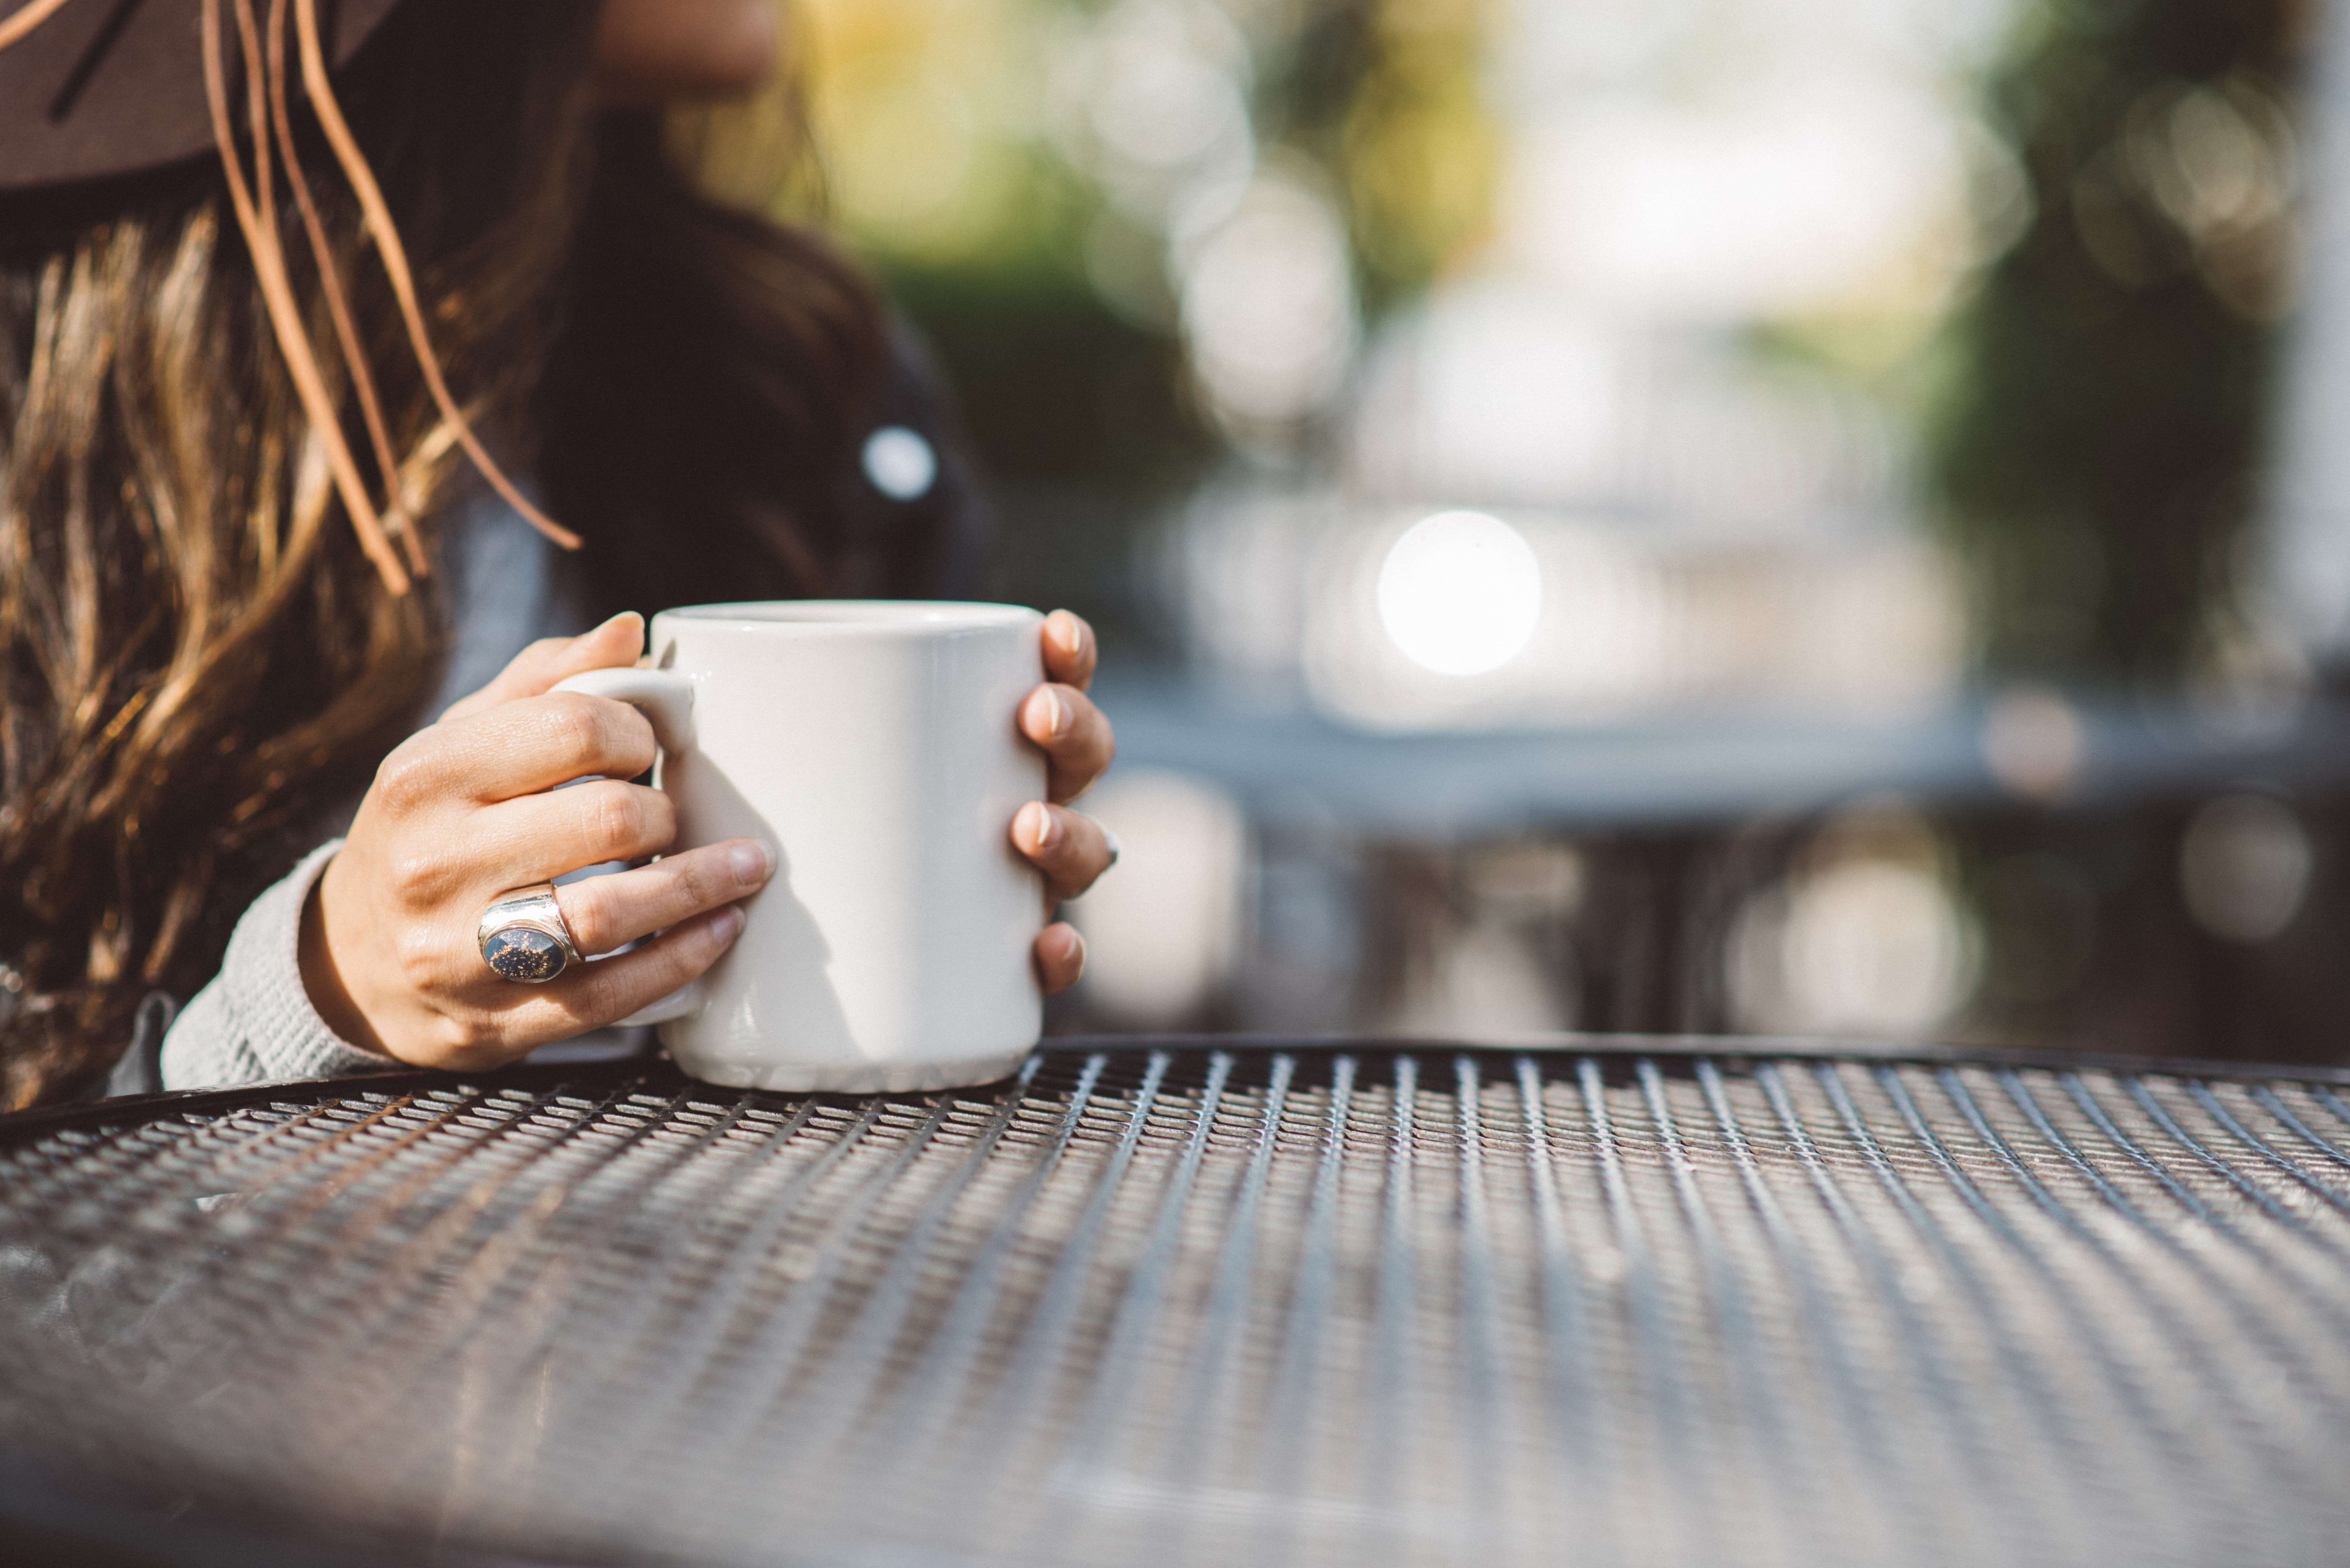 Tρεις εκκεντρικοί και ασυνήθιστοι τρόποι για να καθαρίσεις τον λεκέ από καφέ